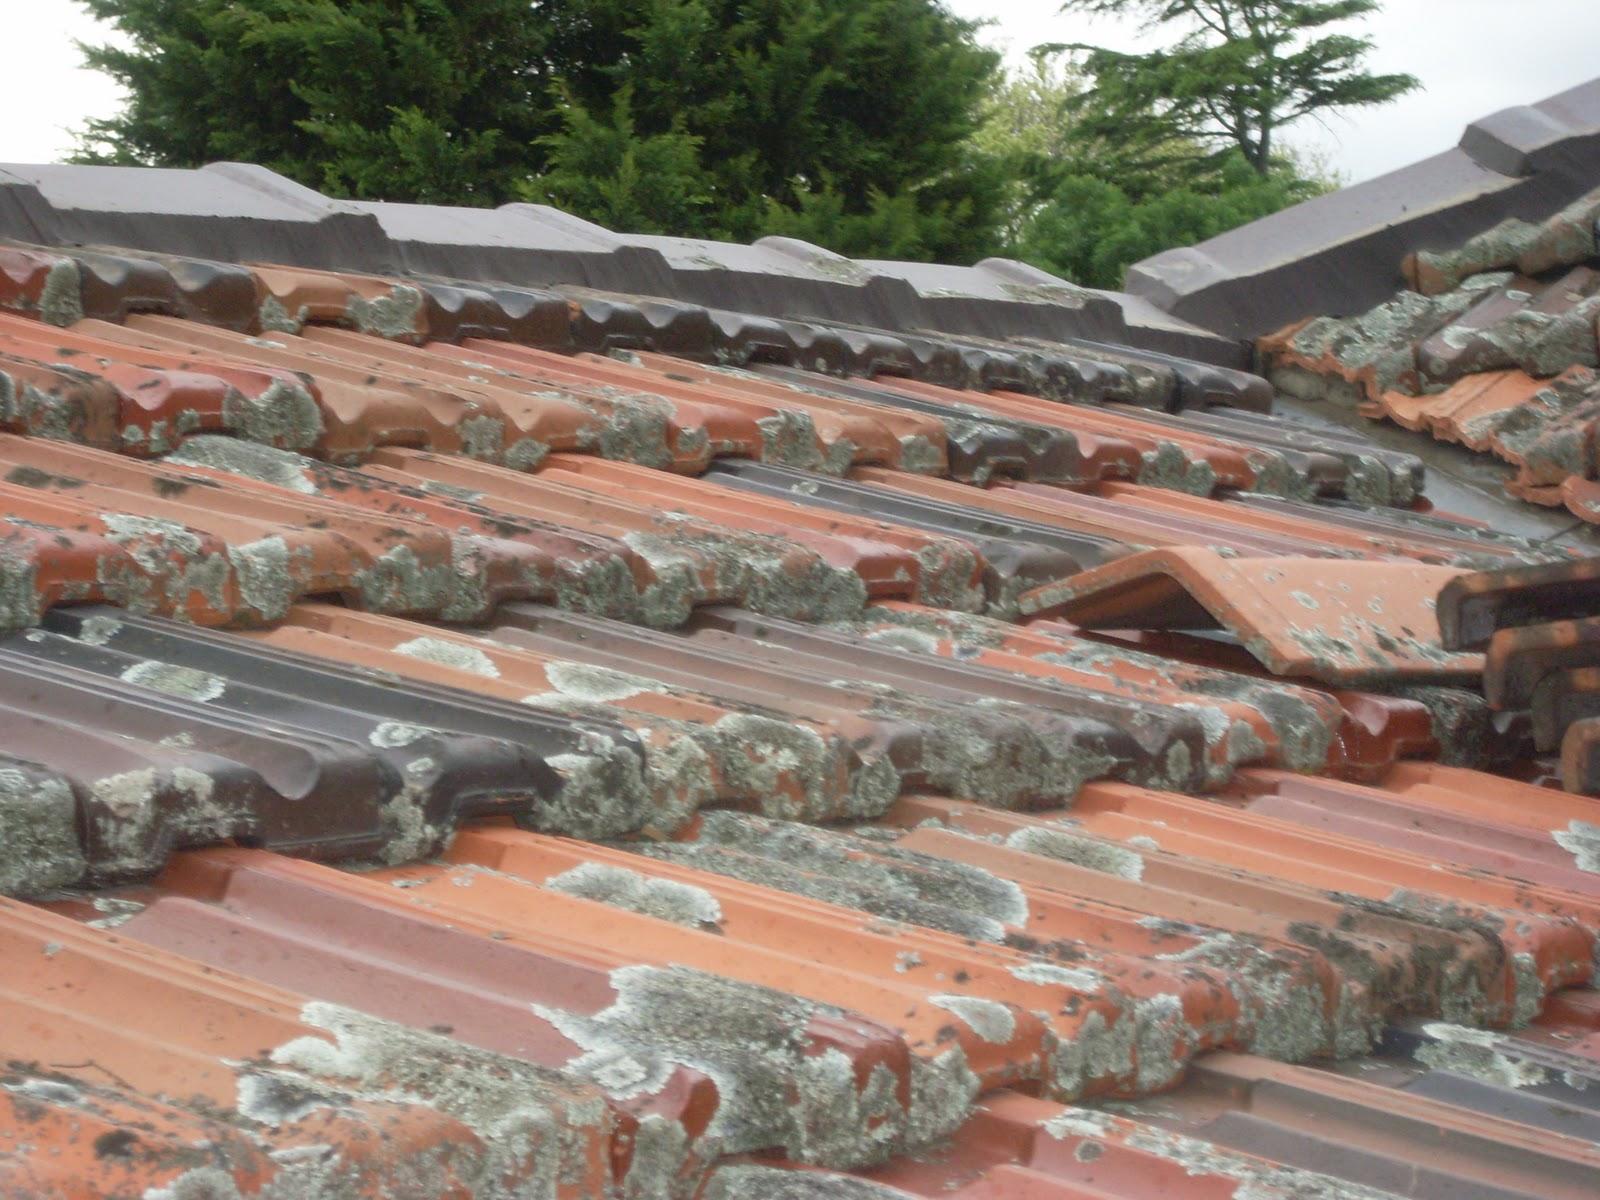 Waynes Home Renos Diy Pointing The Ridge Caps Roof Tiles